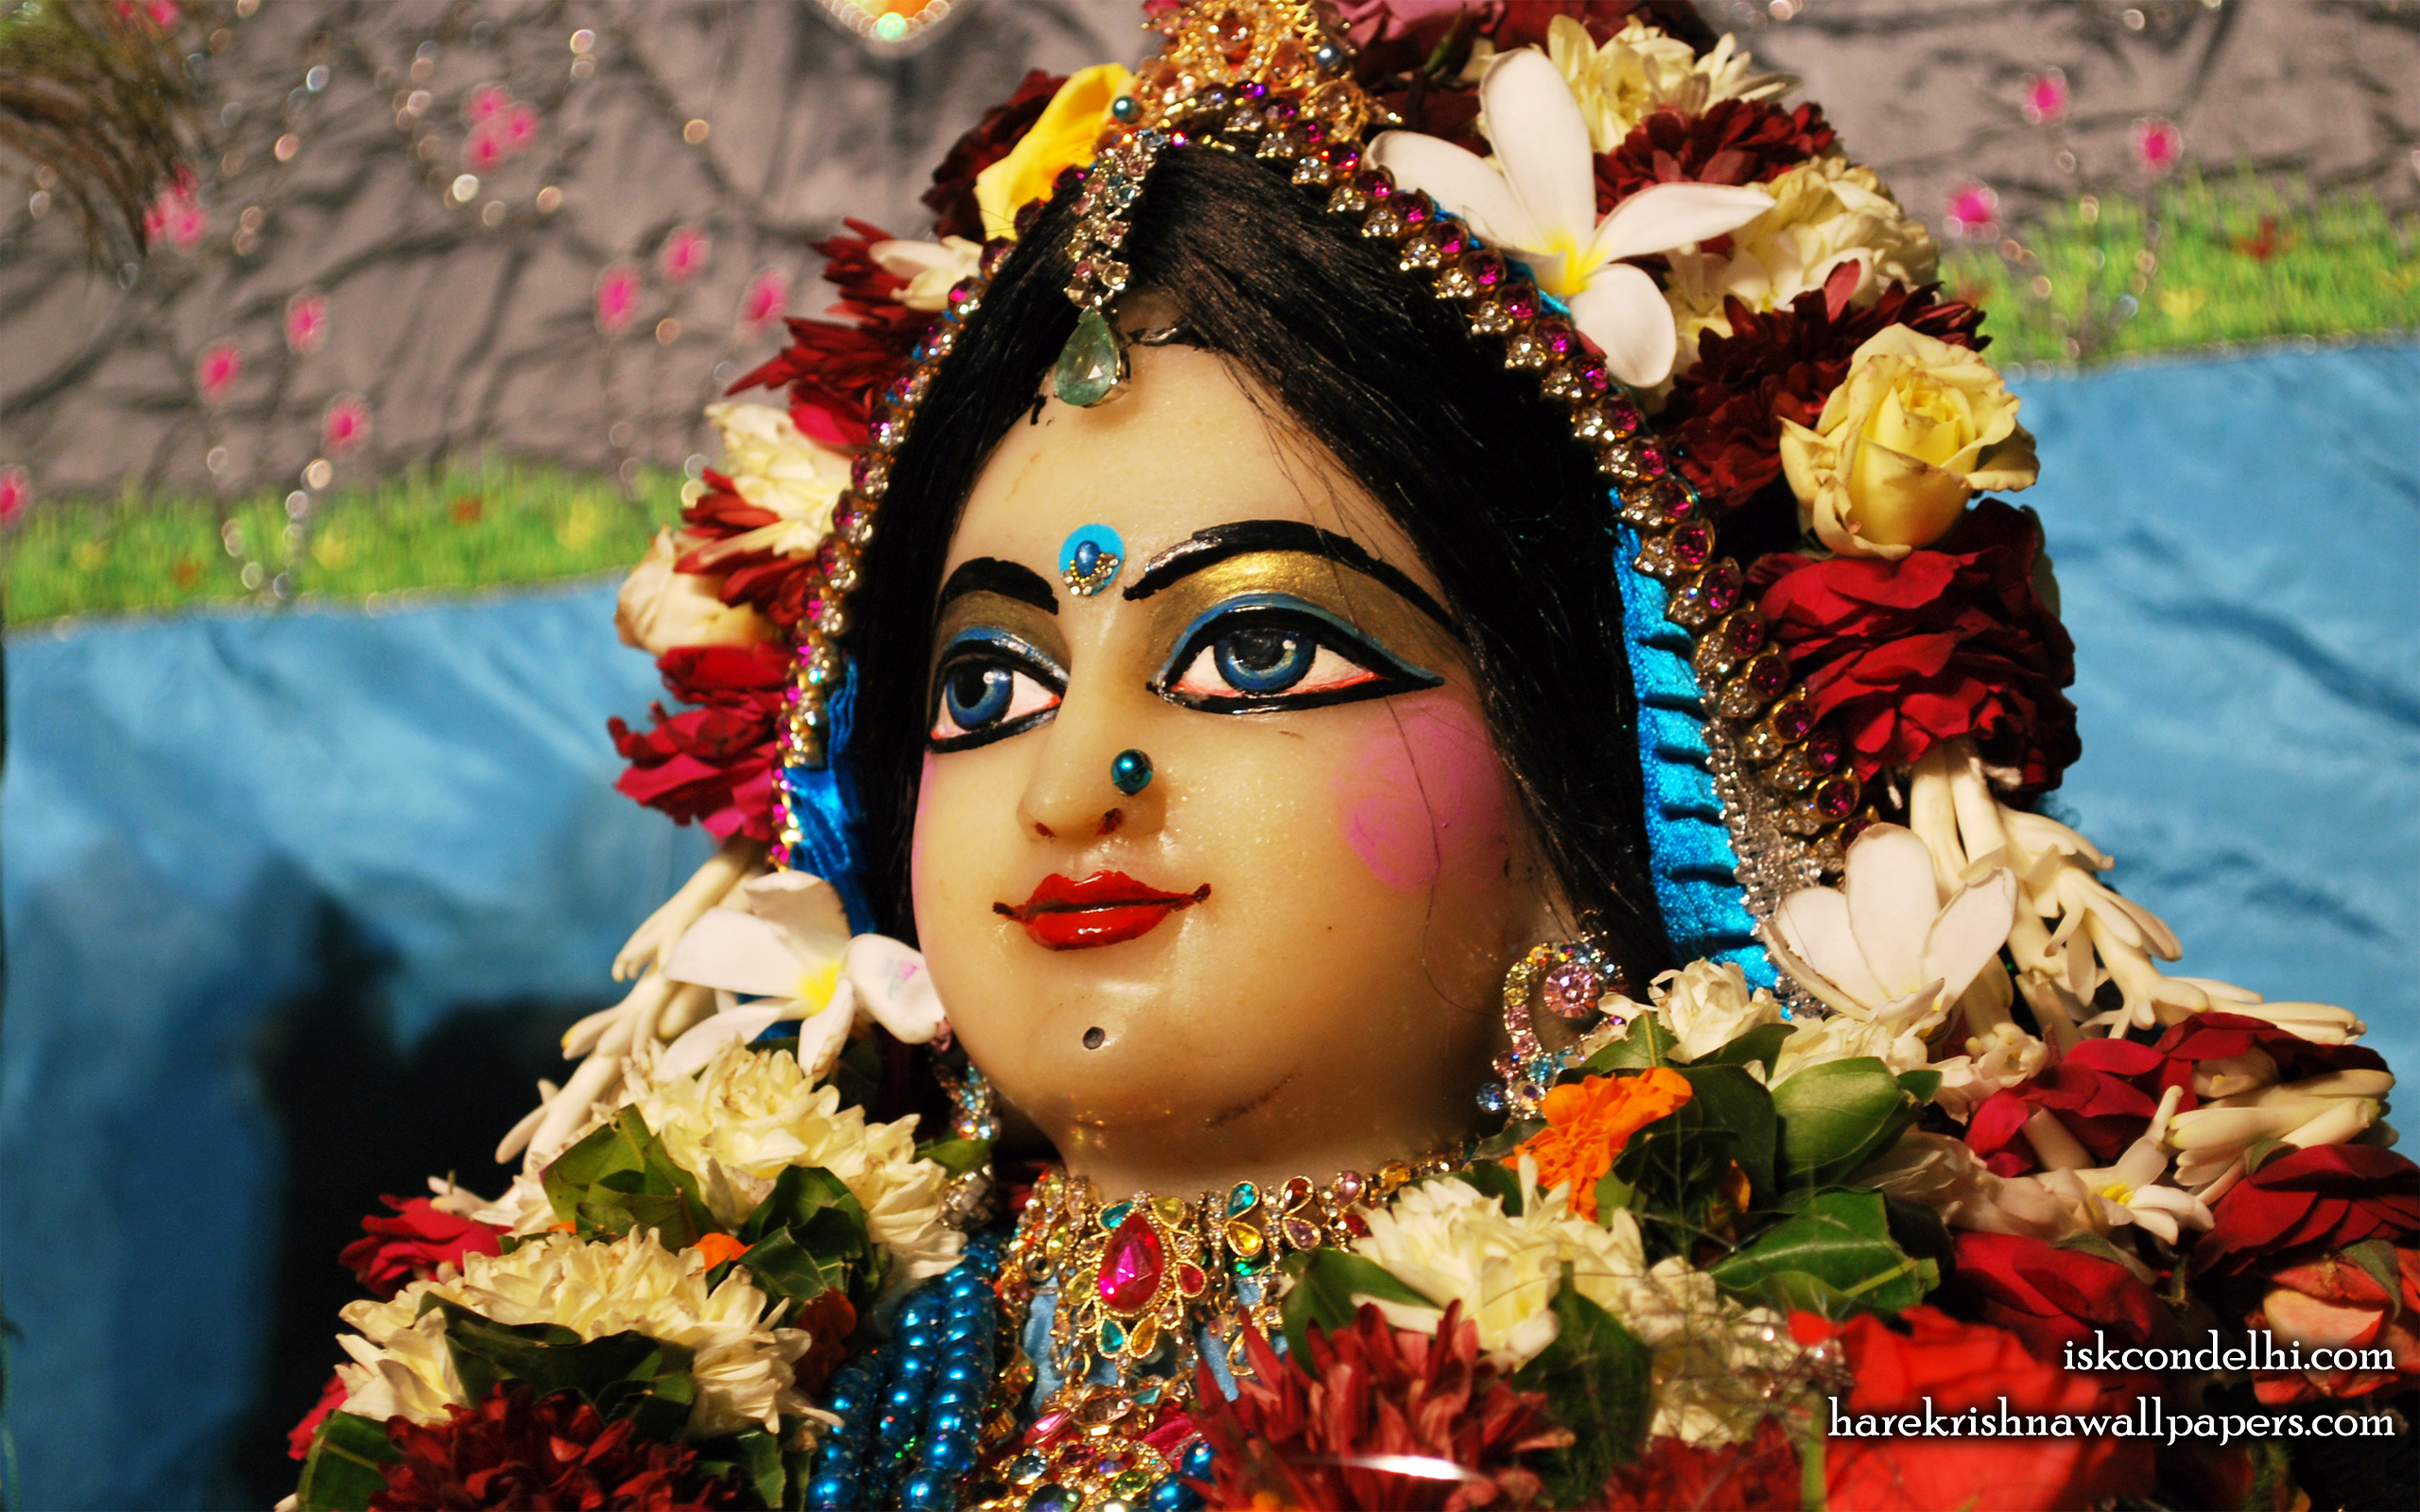 Sri Radha Close up Wallpaper (020) Size 2560x1600 Download